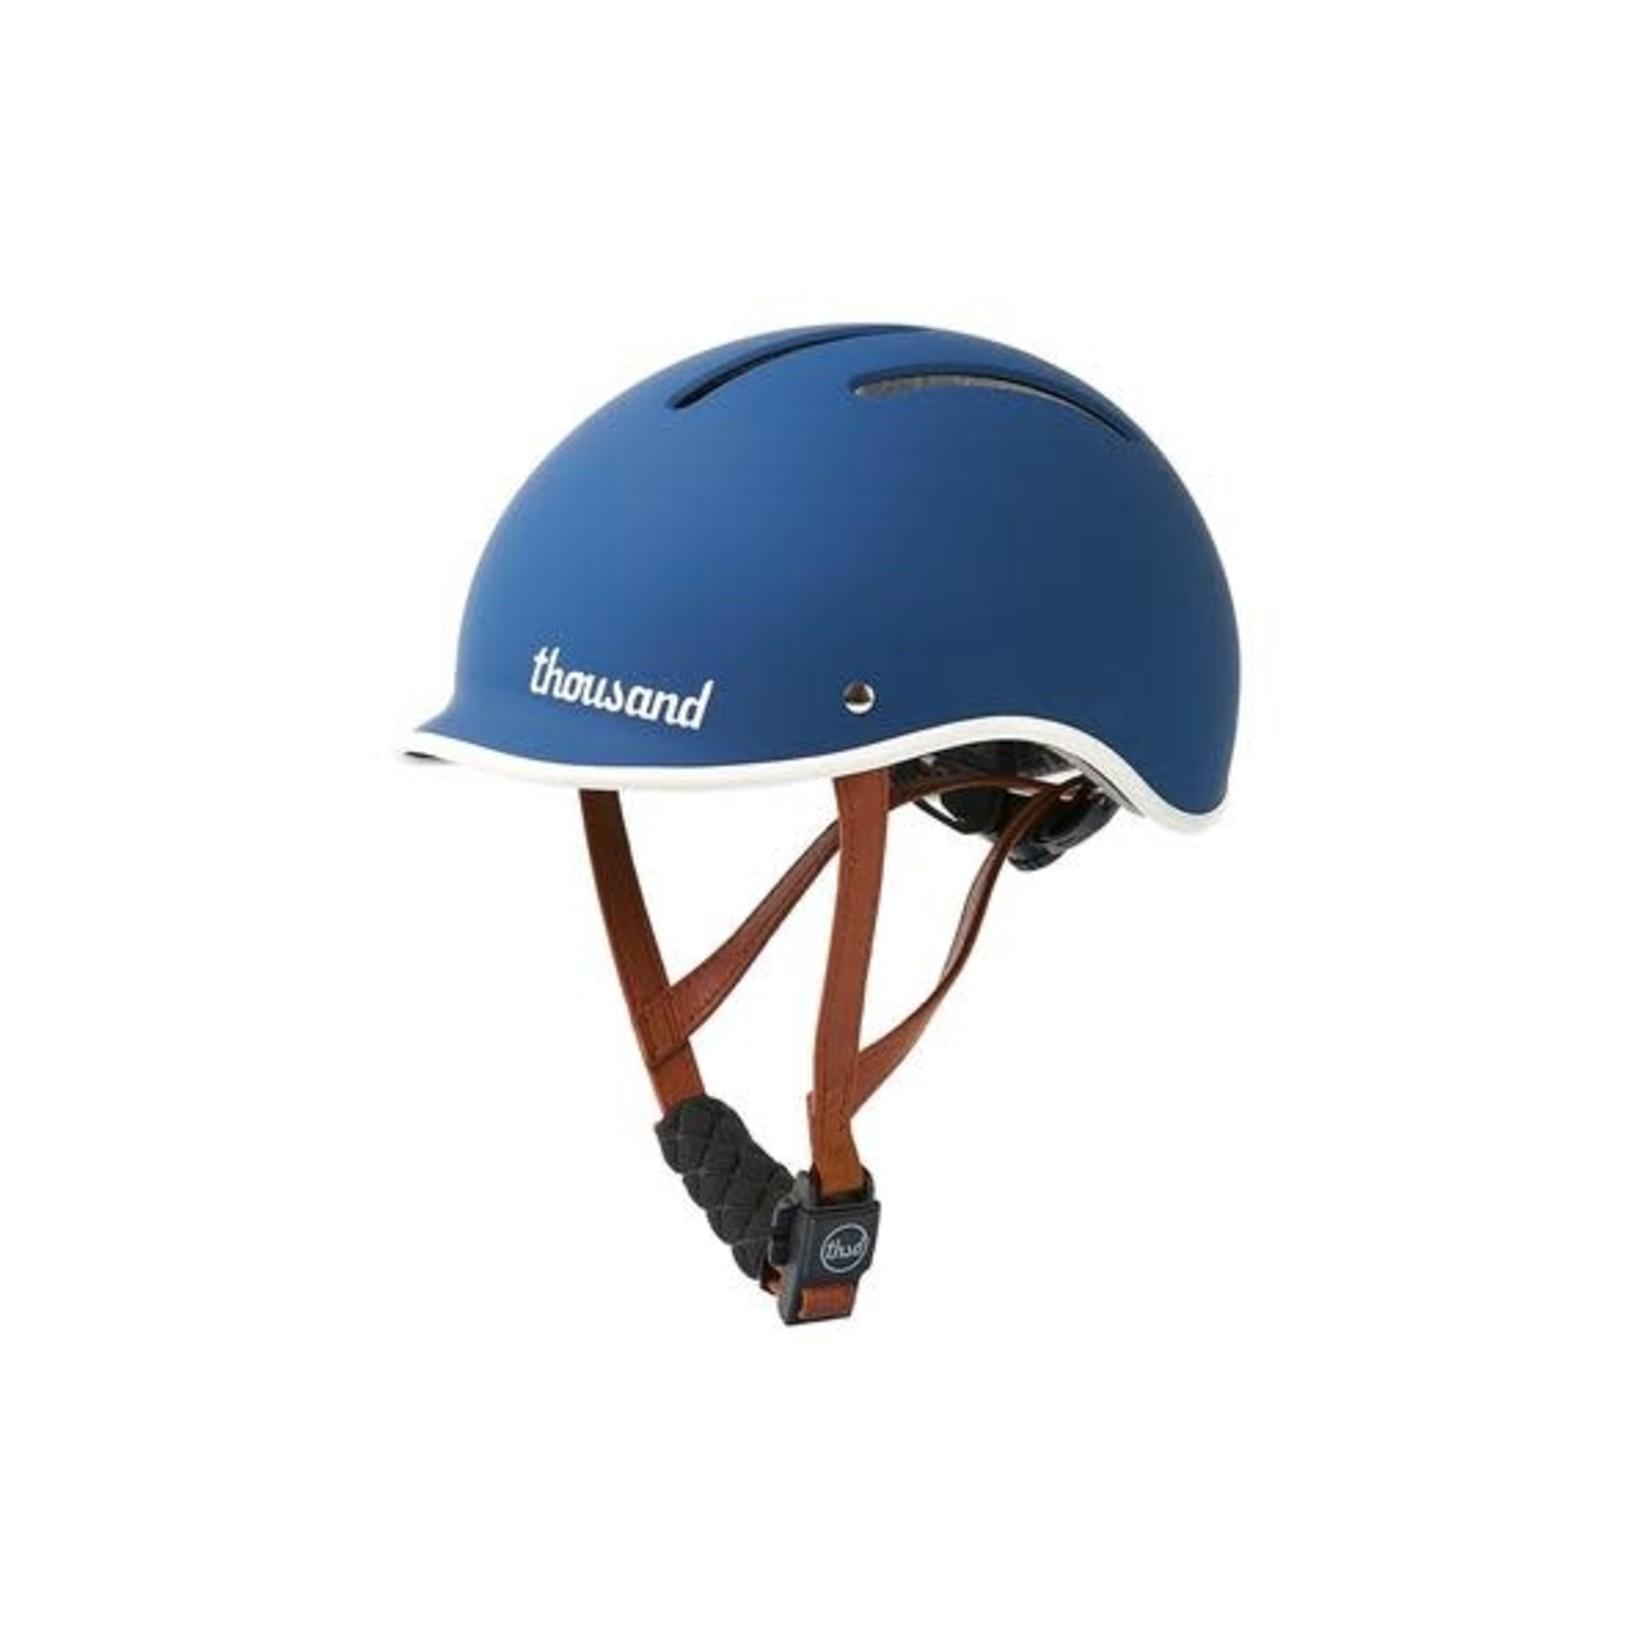 Thousand Thousand Jr Kids Helmet